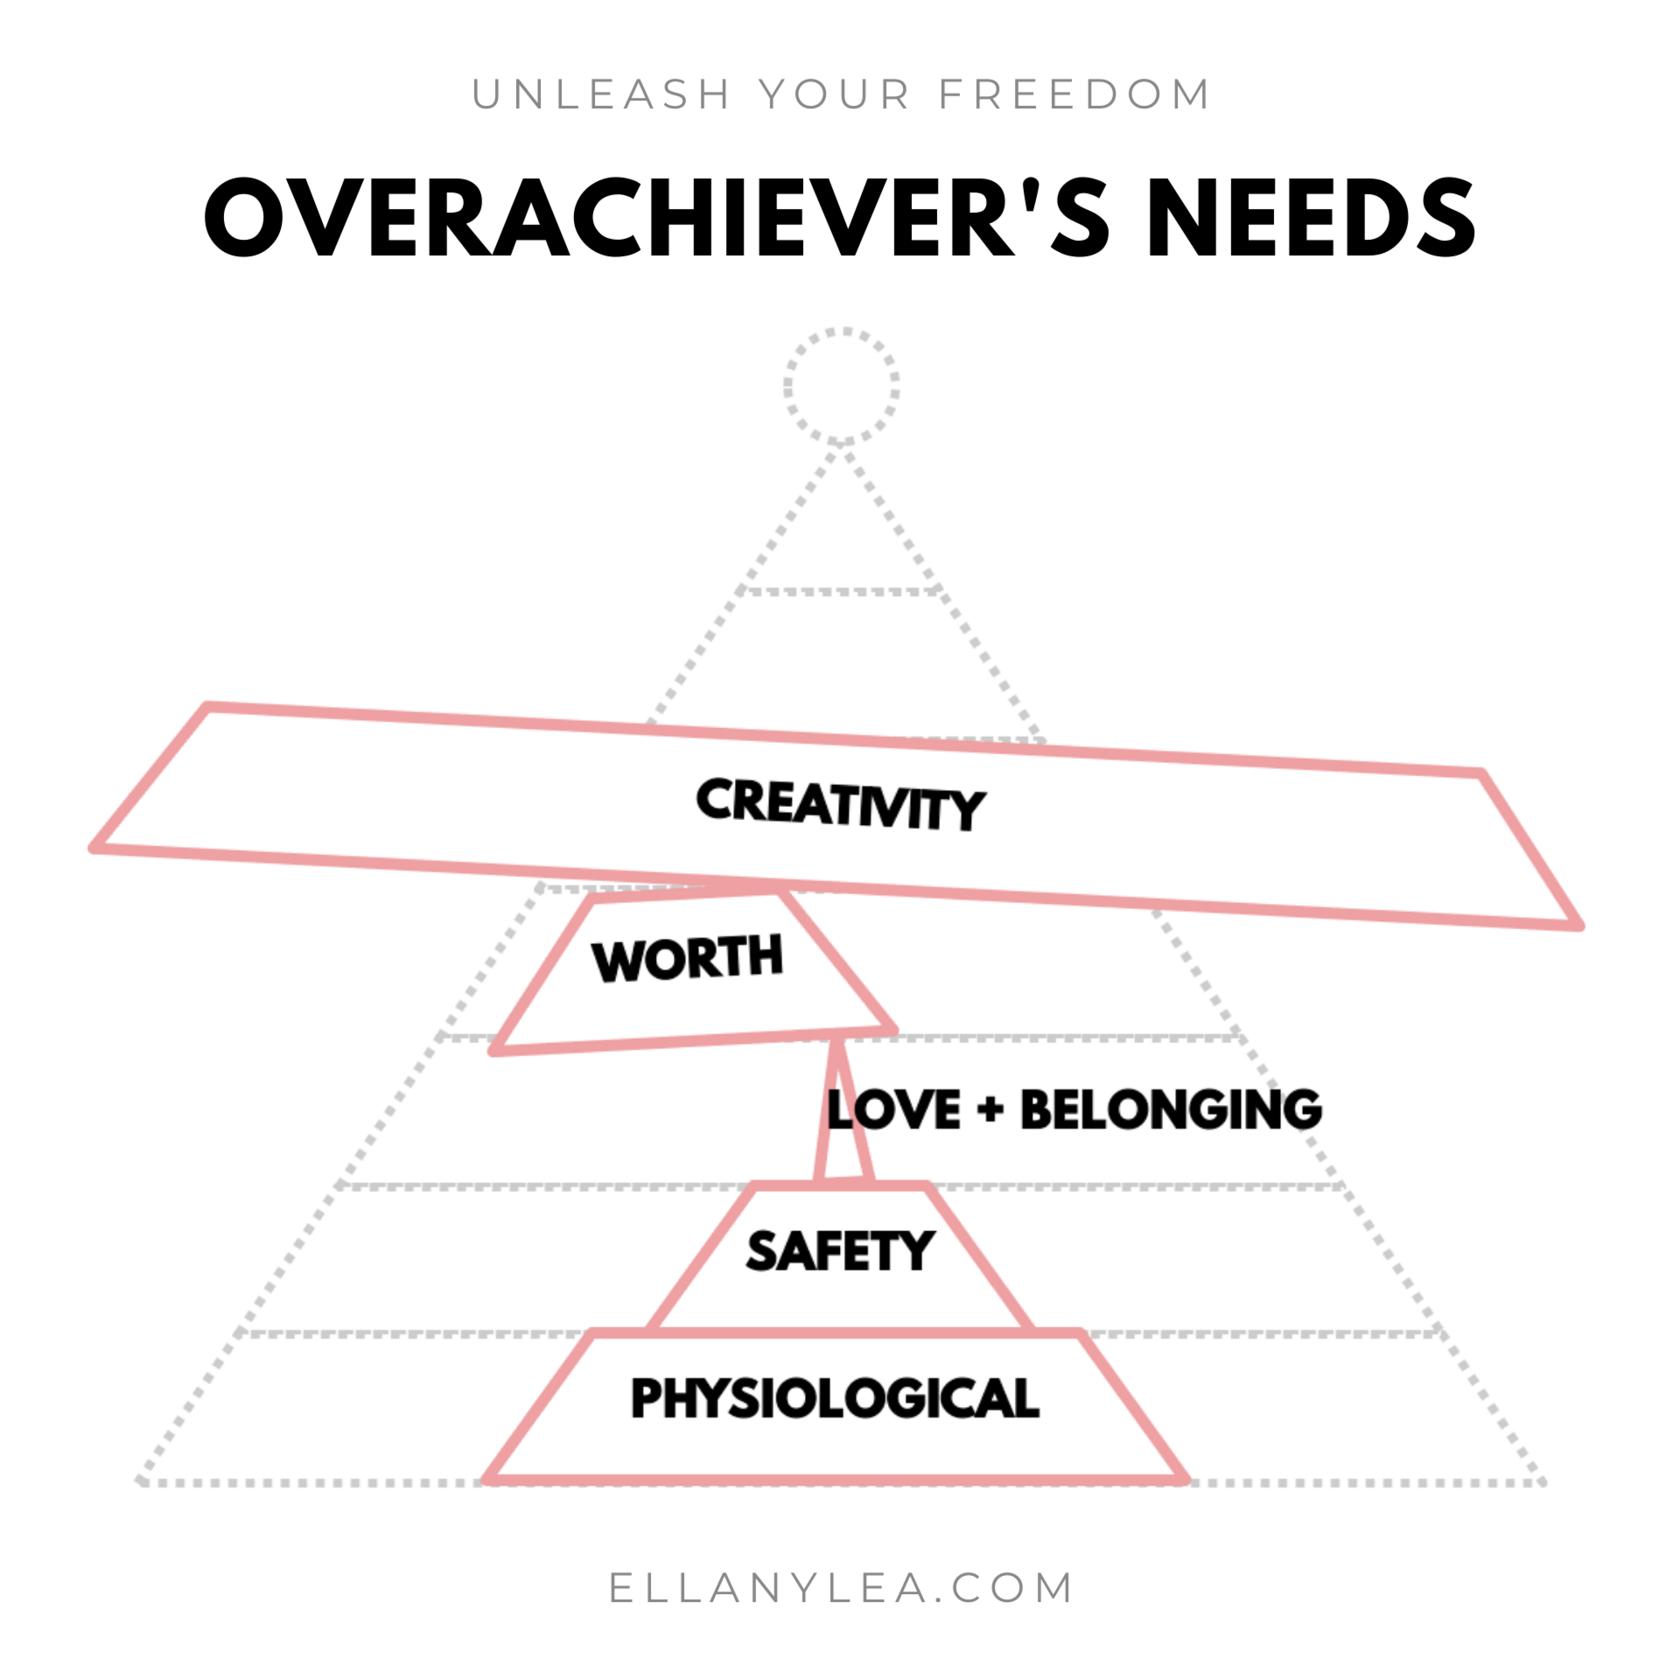 EL - Overachievers Hierarchy of Needs - Stack creativity